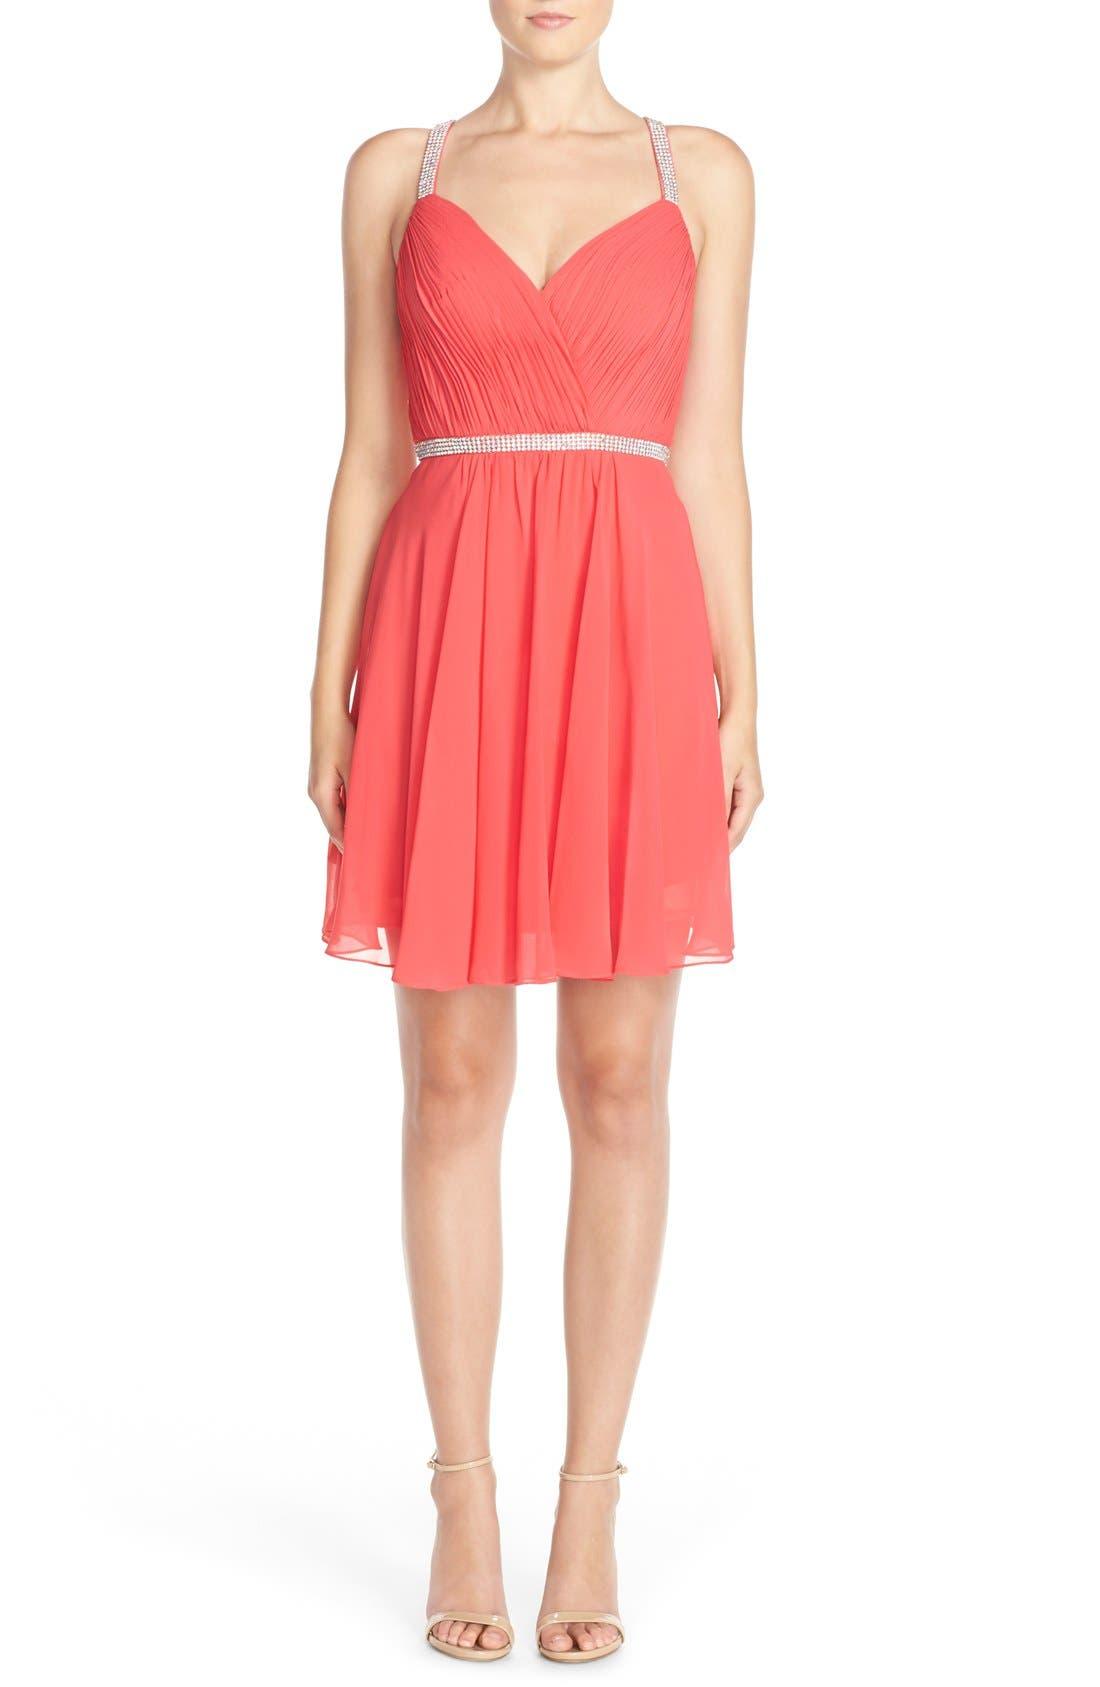 Alternate Image 1 Selected - FavianaEmbellished Chiffon Fit& Flare Dress